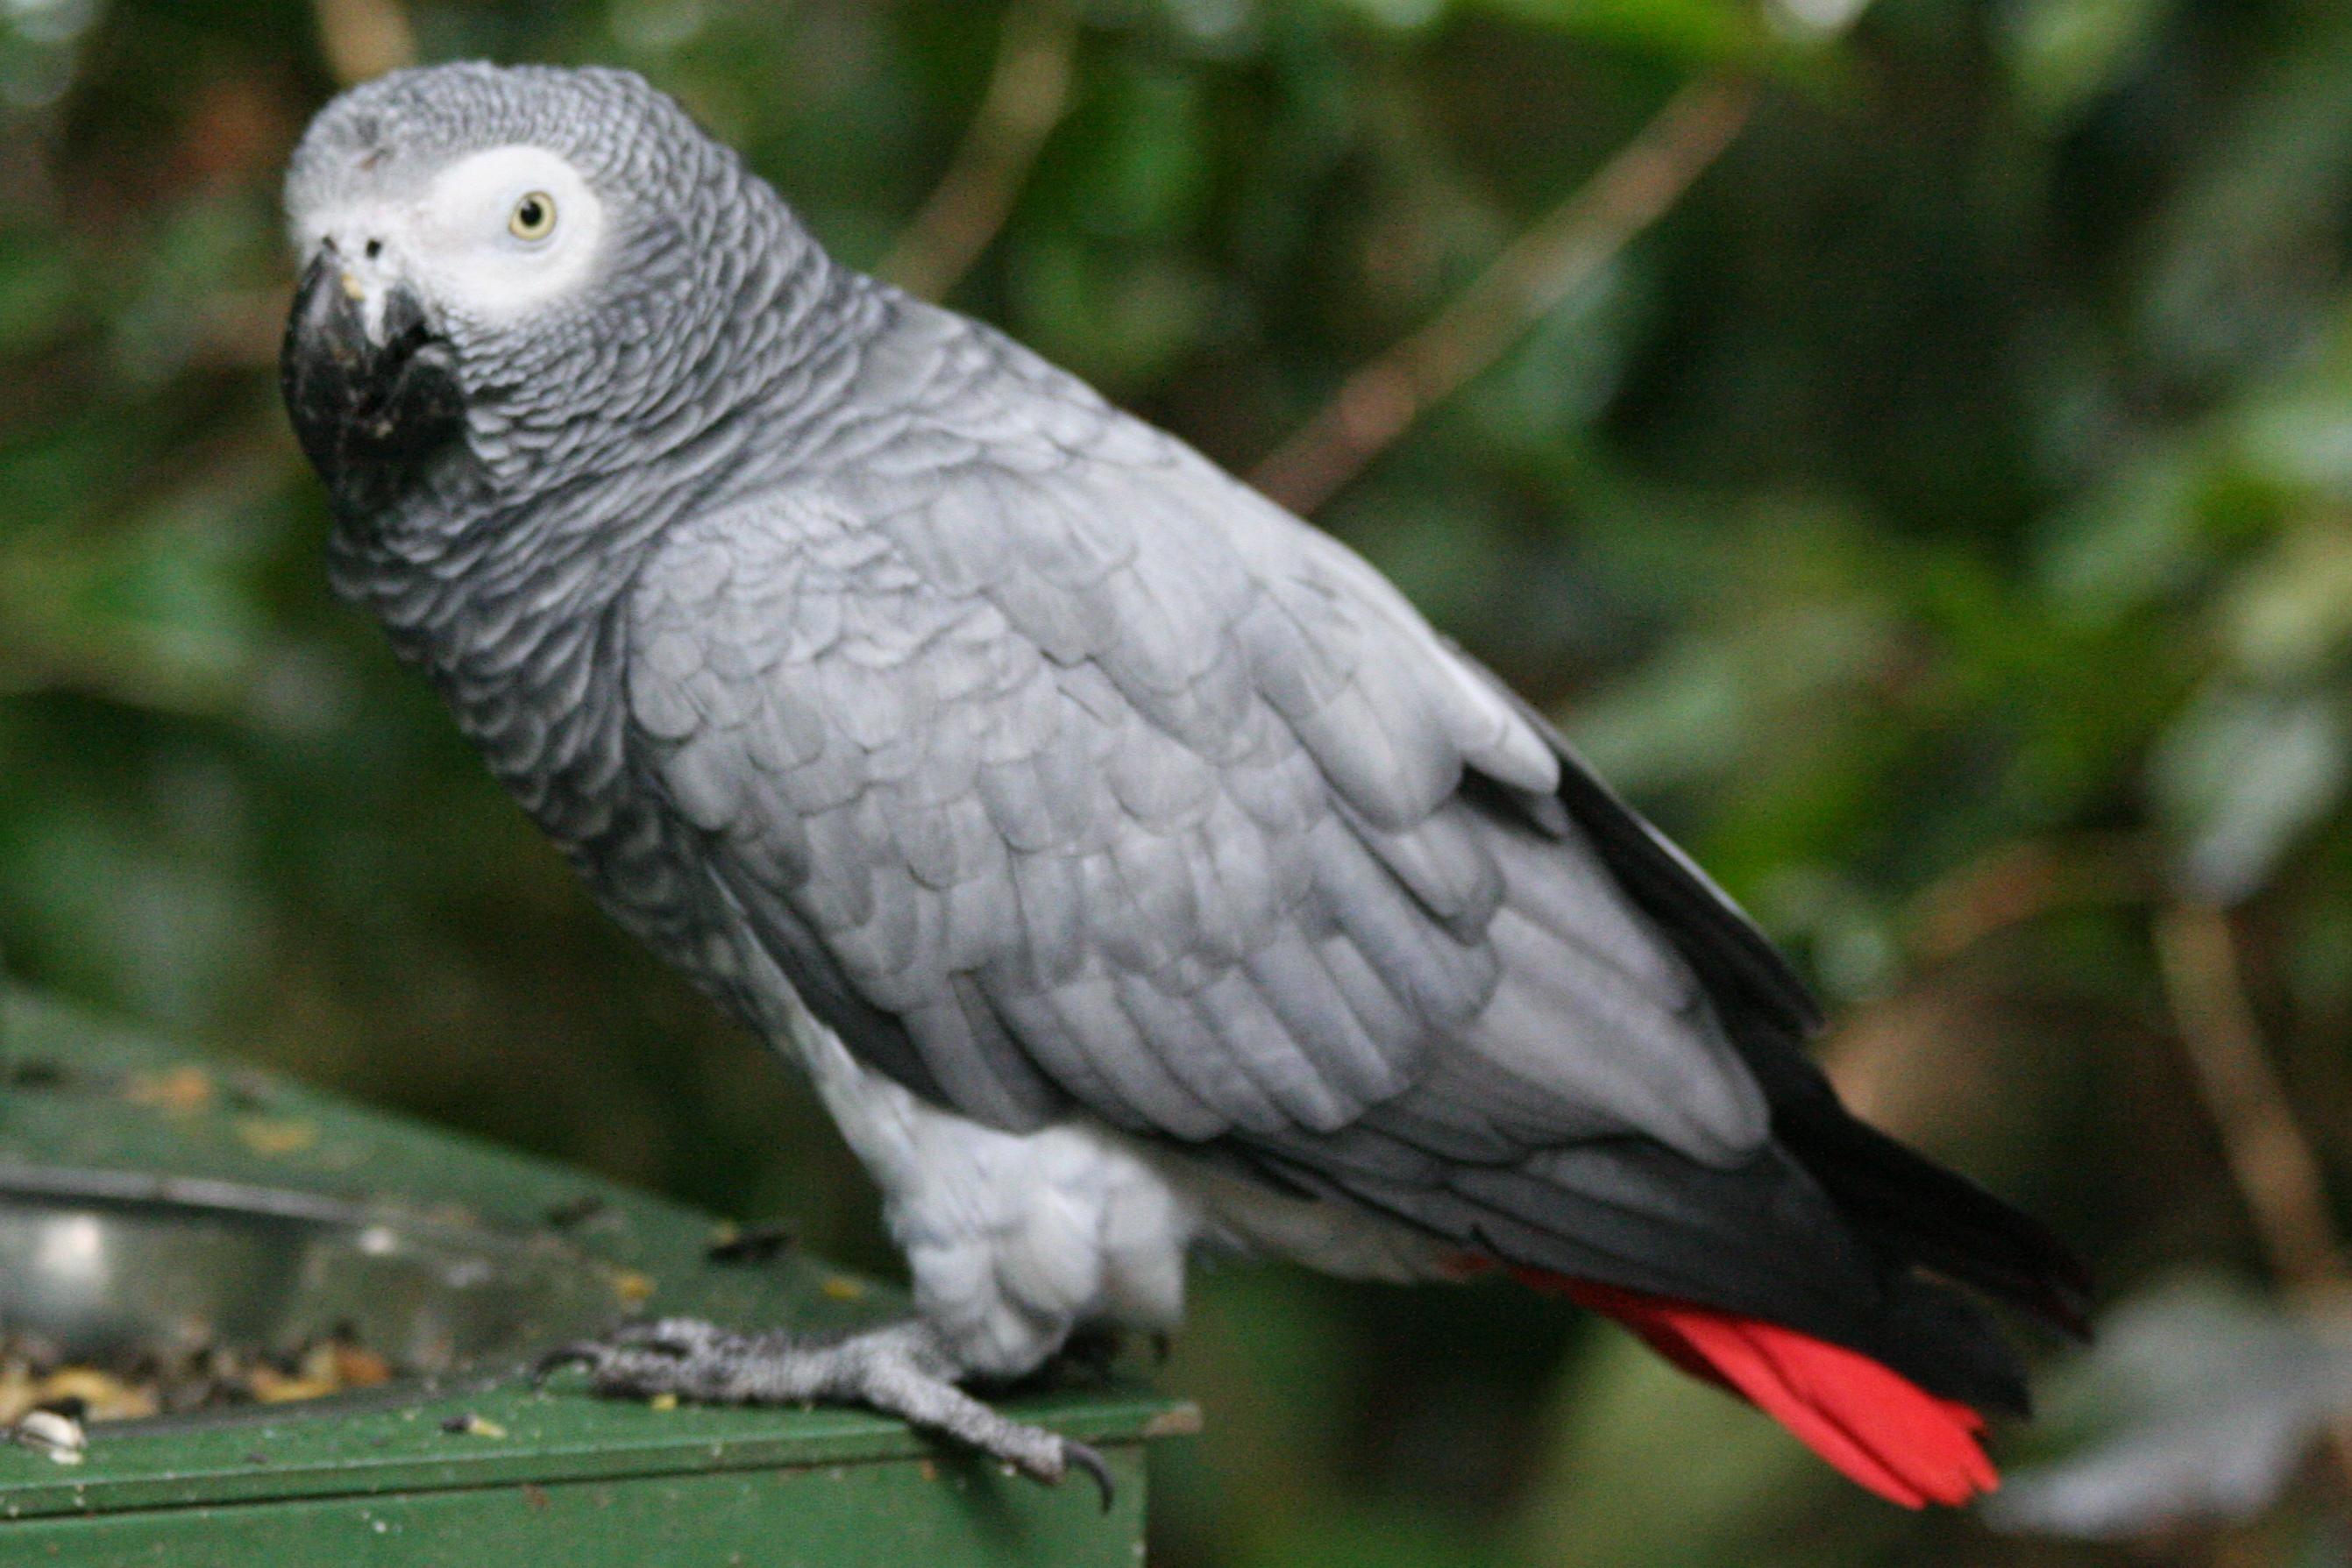 Psittacus_erithacus_erithacus_-Birds_of_Eden-8a